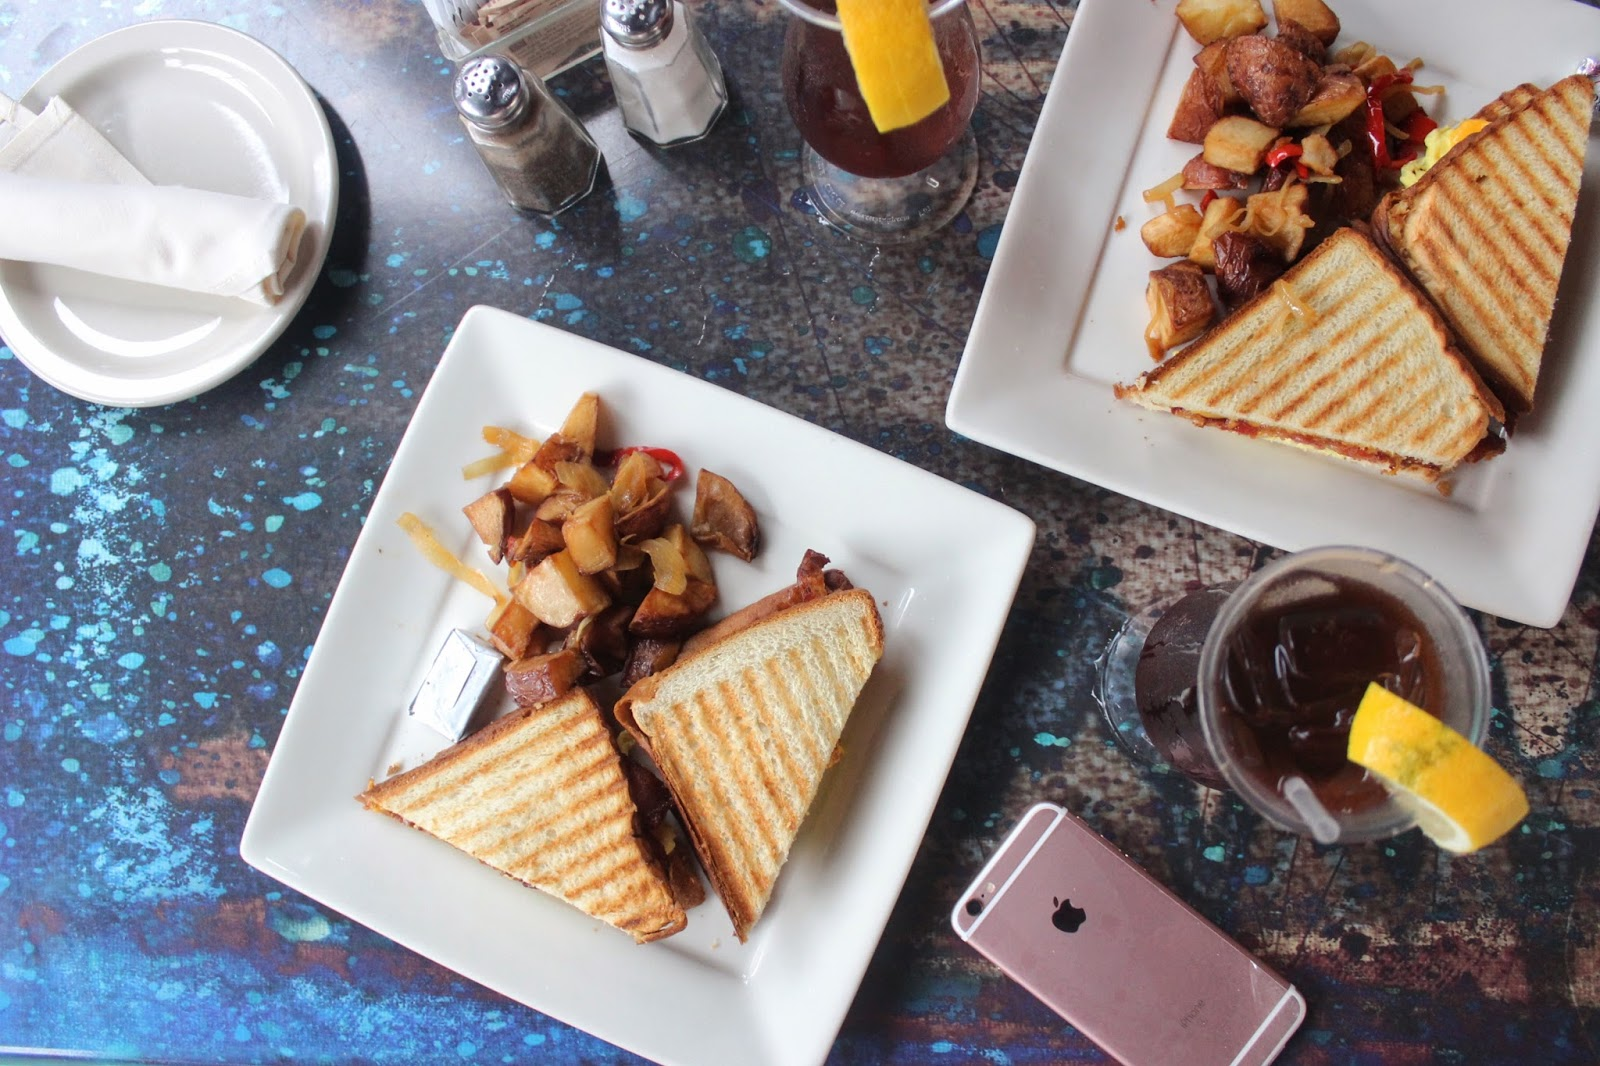 lifesthayle-miami-photodiary-lincoln-road-breakfast.jpg